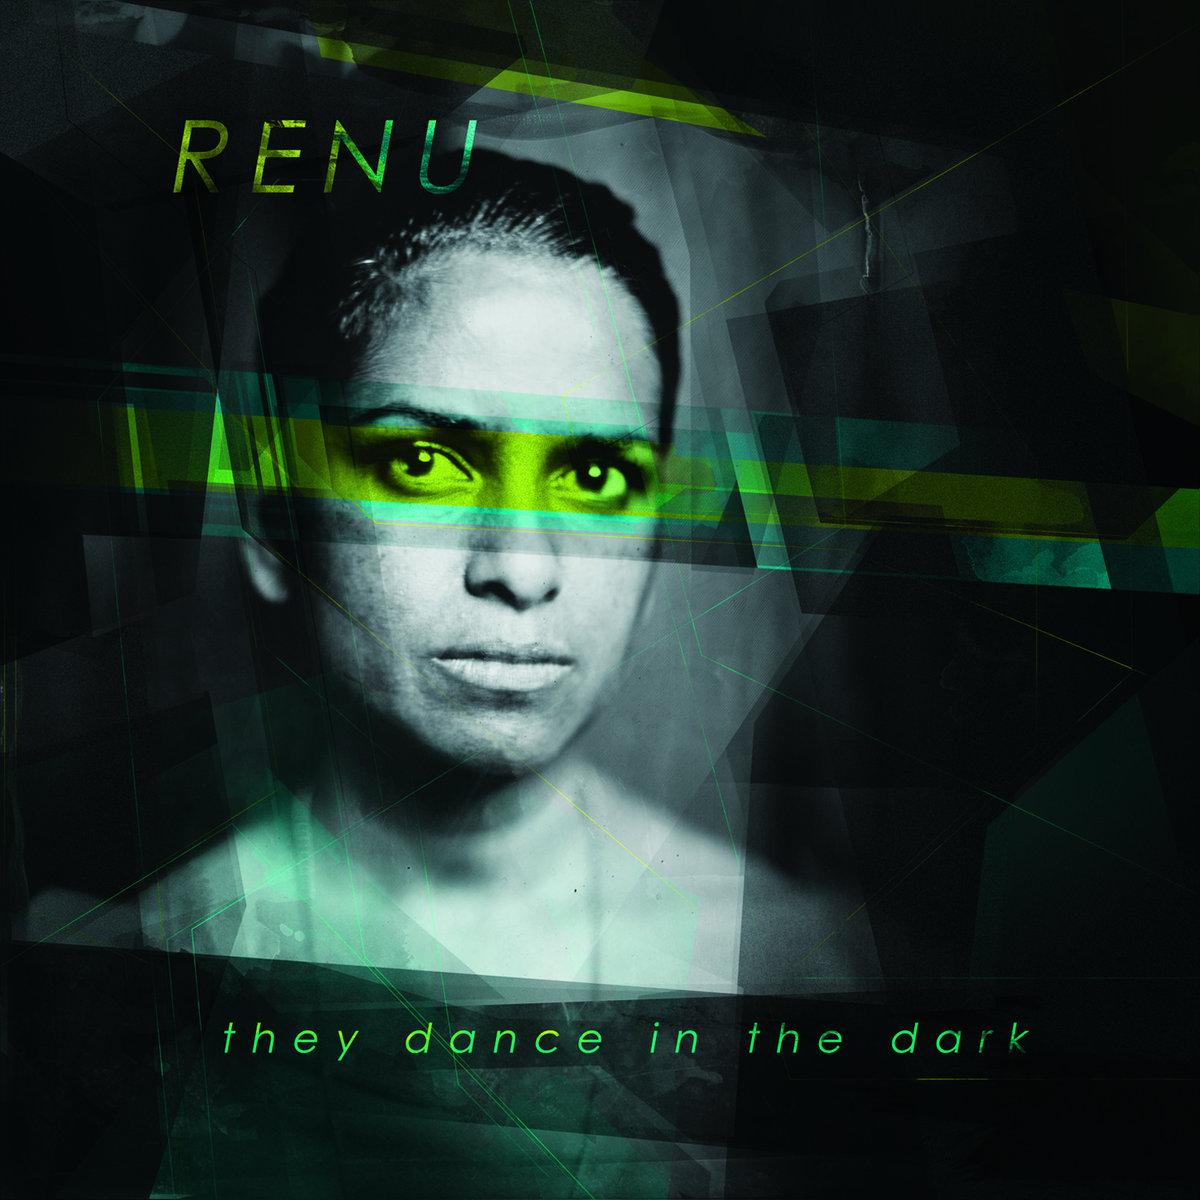 They dance in the dark | renu.